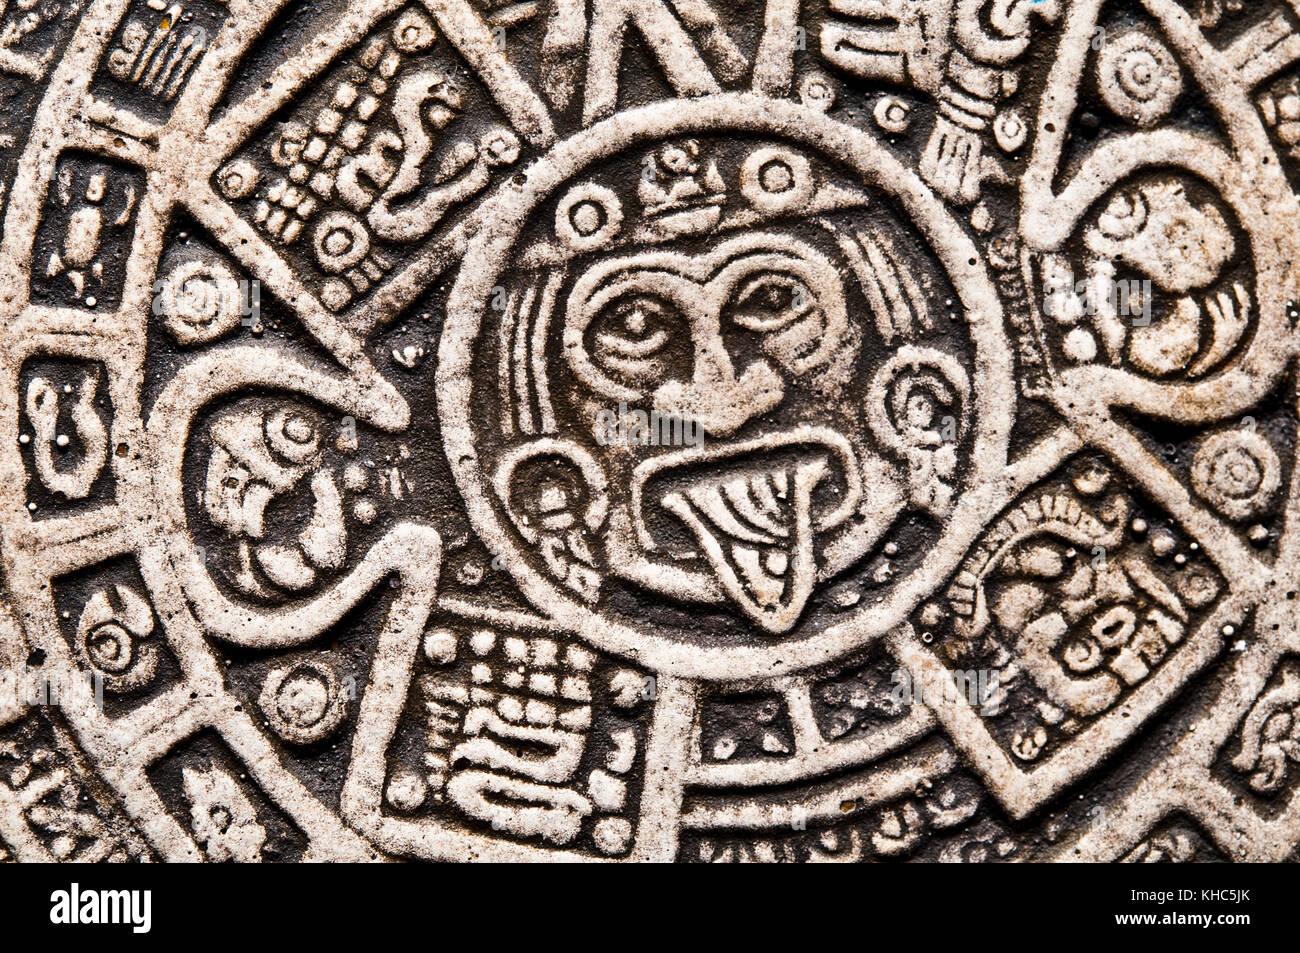 Aztec Calendar Stone.The Aztec Calendar Stone Stock Photos The Aztec Calendar Stone